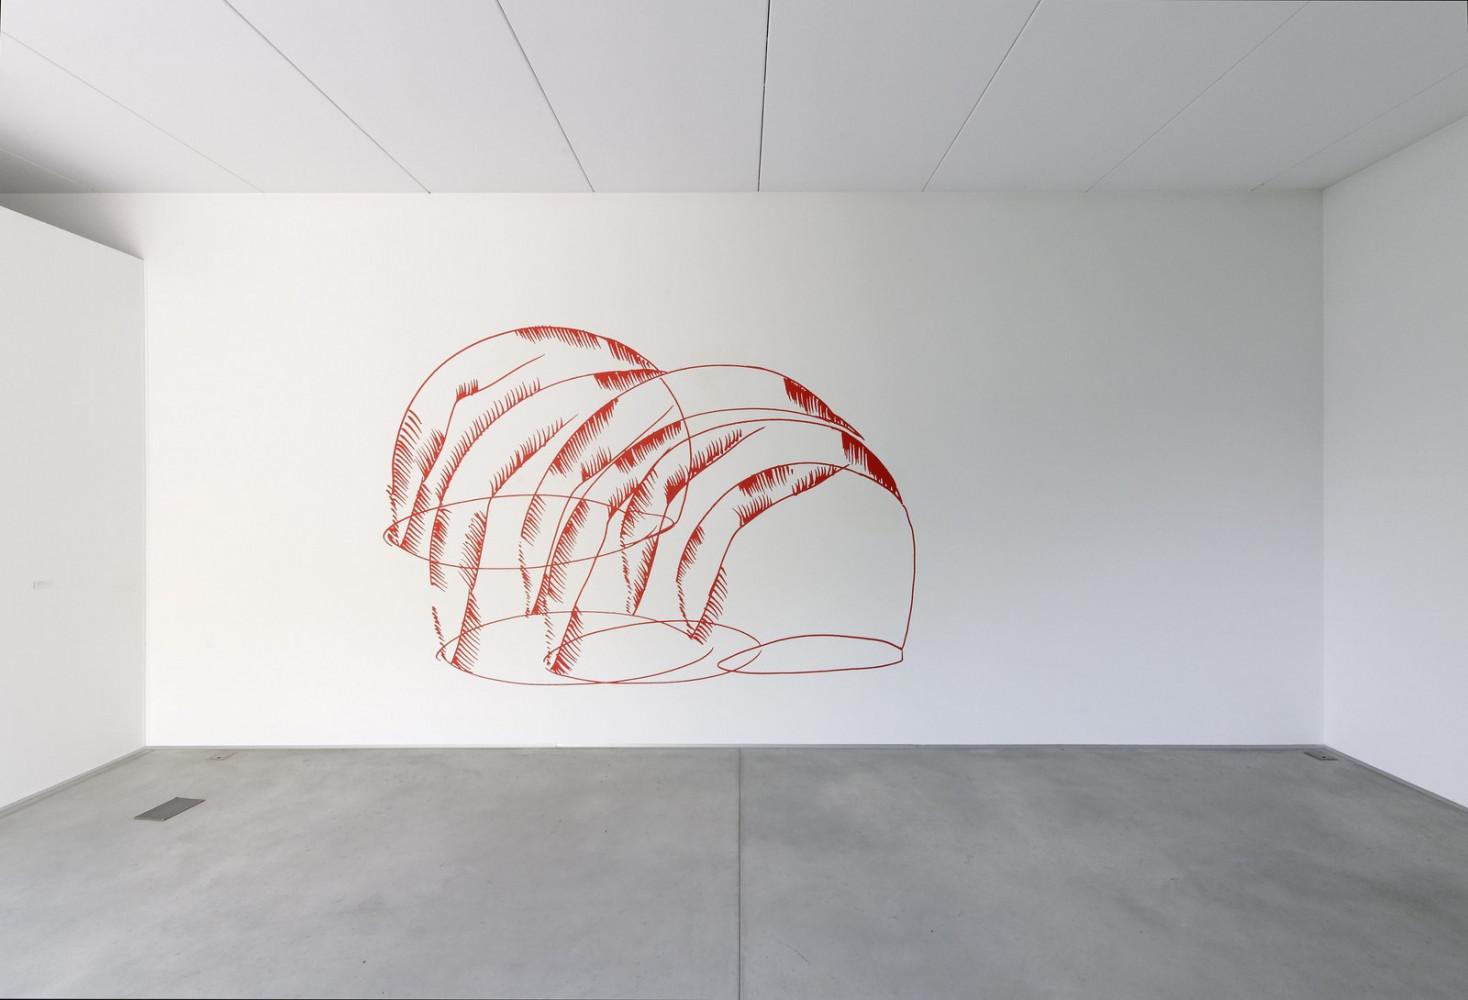 Mario Merz, 'Wall Works – Giovanni Anselmo_Daniel Buren_Lawrence Carroll_Mario Merz_Felice Varini_Lawrence Weiner'